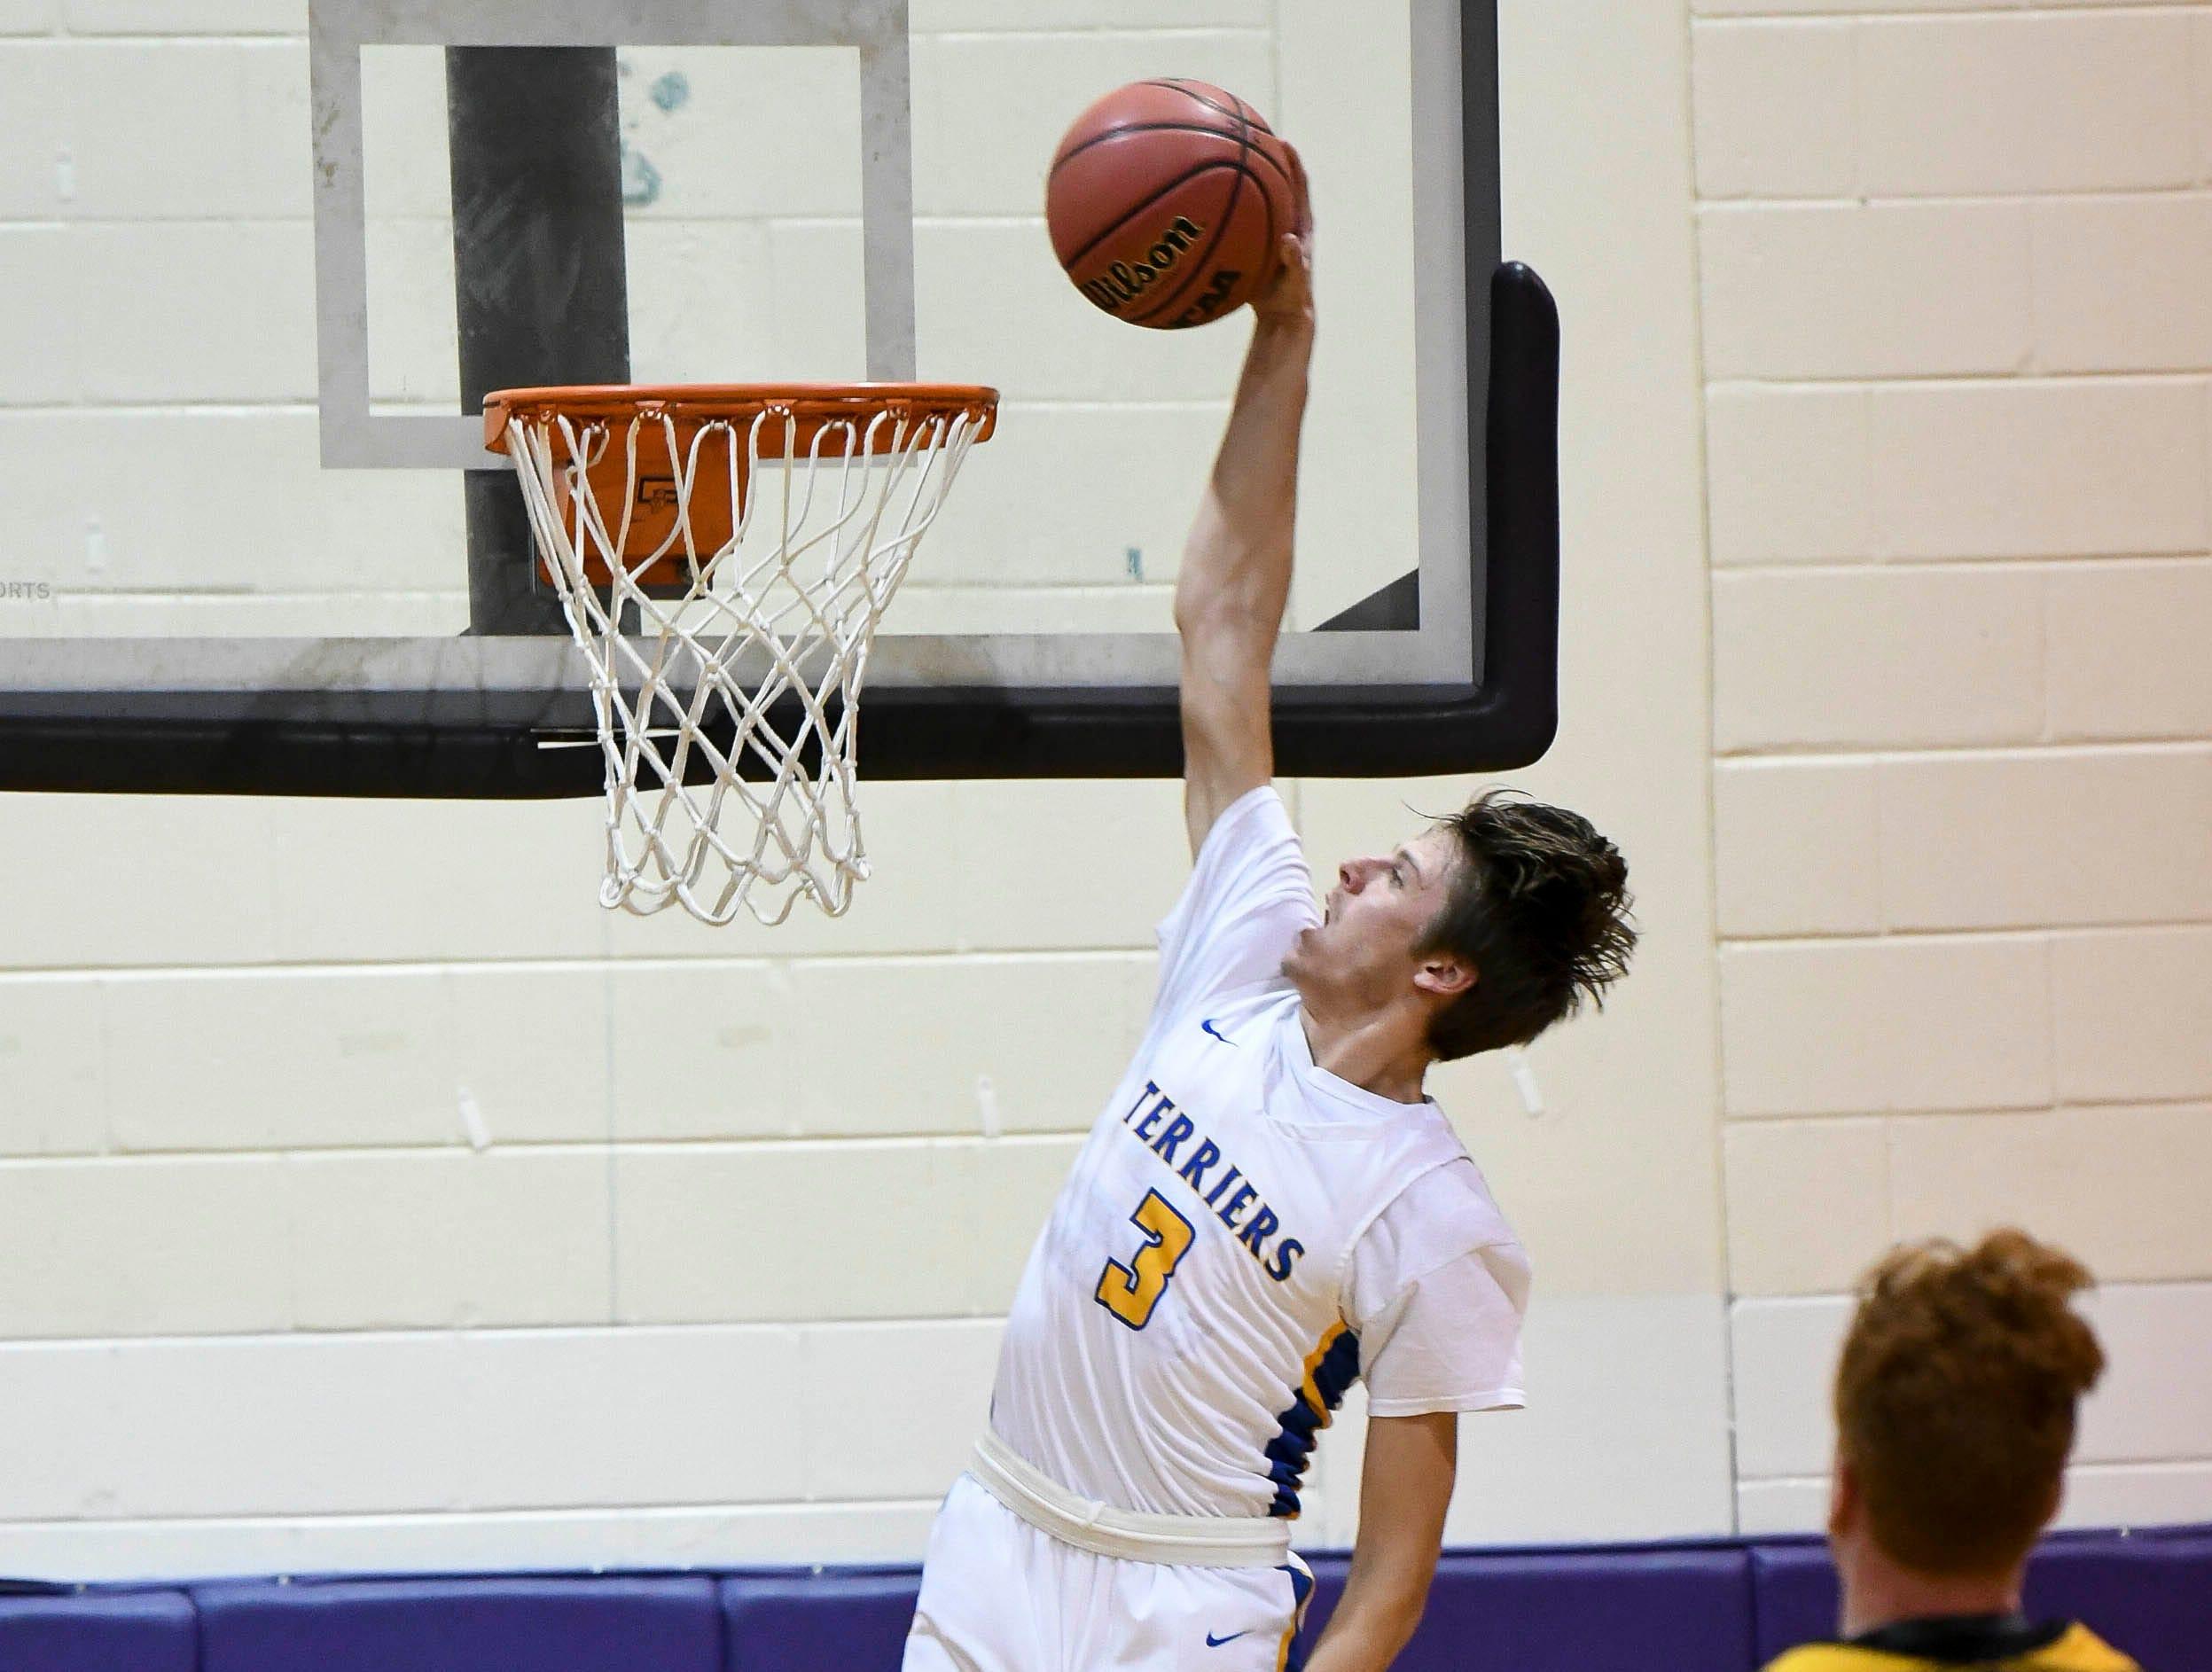 Titusville's Trent Cunningham dunks the ball during Tuesday District 14-6A boys basketball tournament game against Merritt Island.